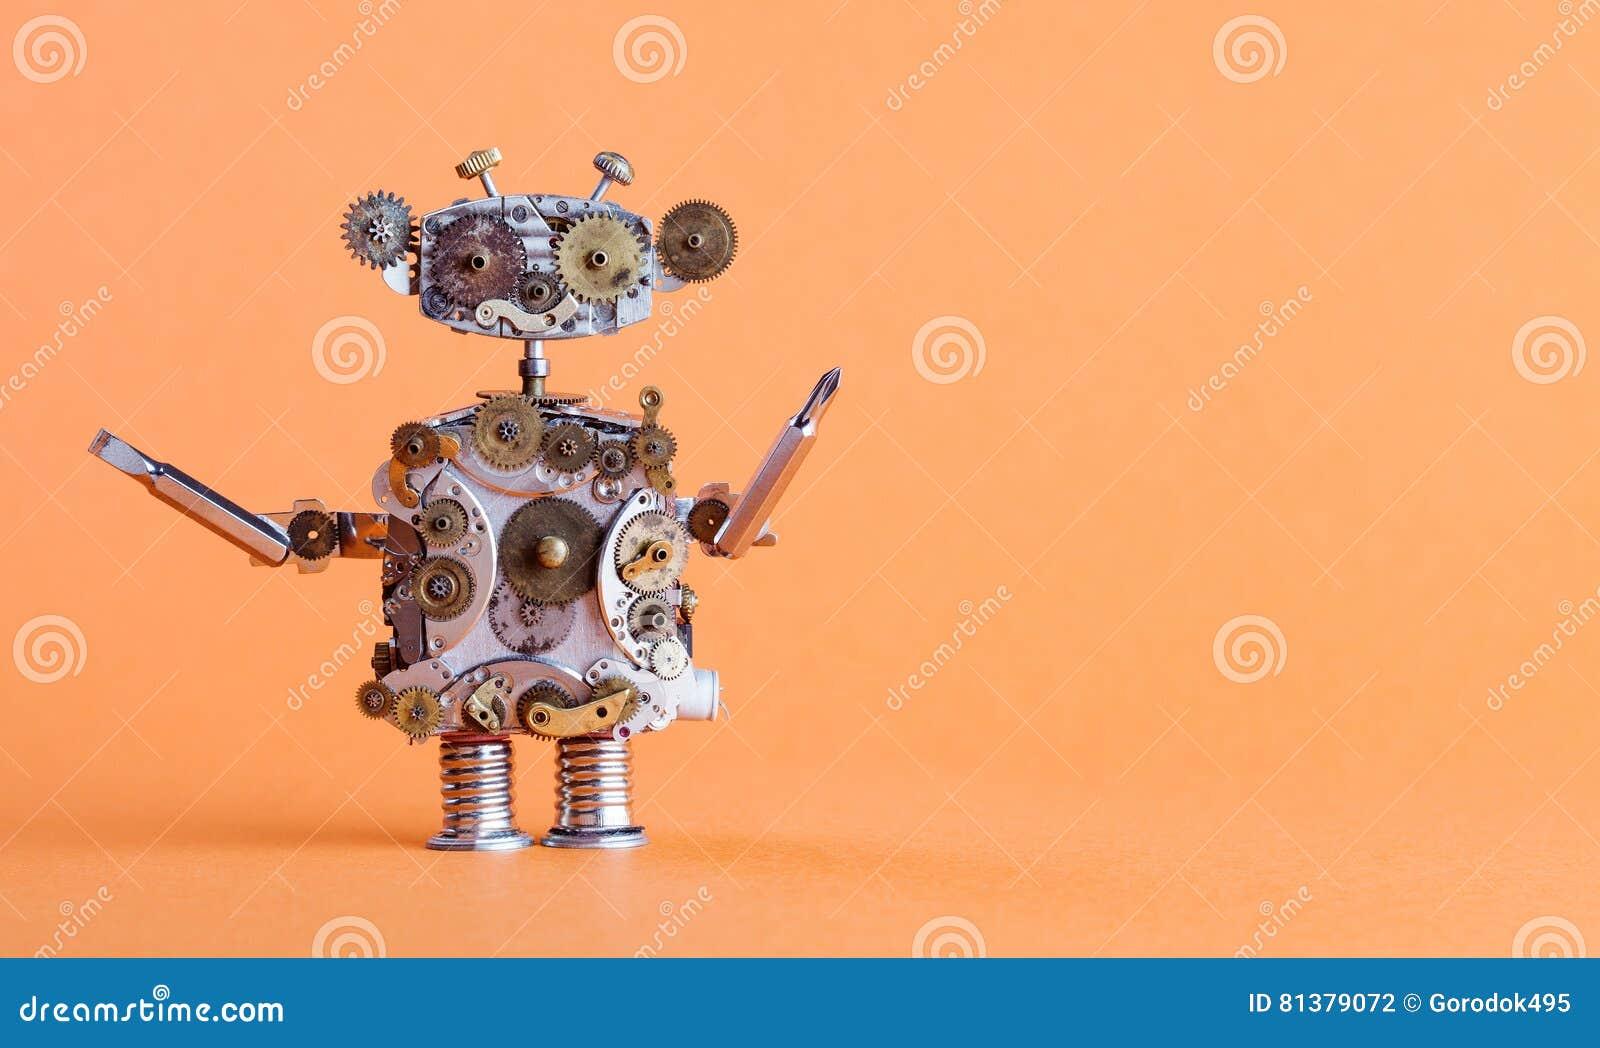 Steampunk样式有螺丝刀的机器人杂物工 滑稽的玩具机械字符,修理公司概念 年迈的齿轮,嵌齿轮